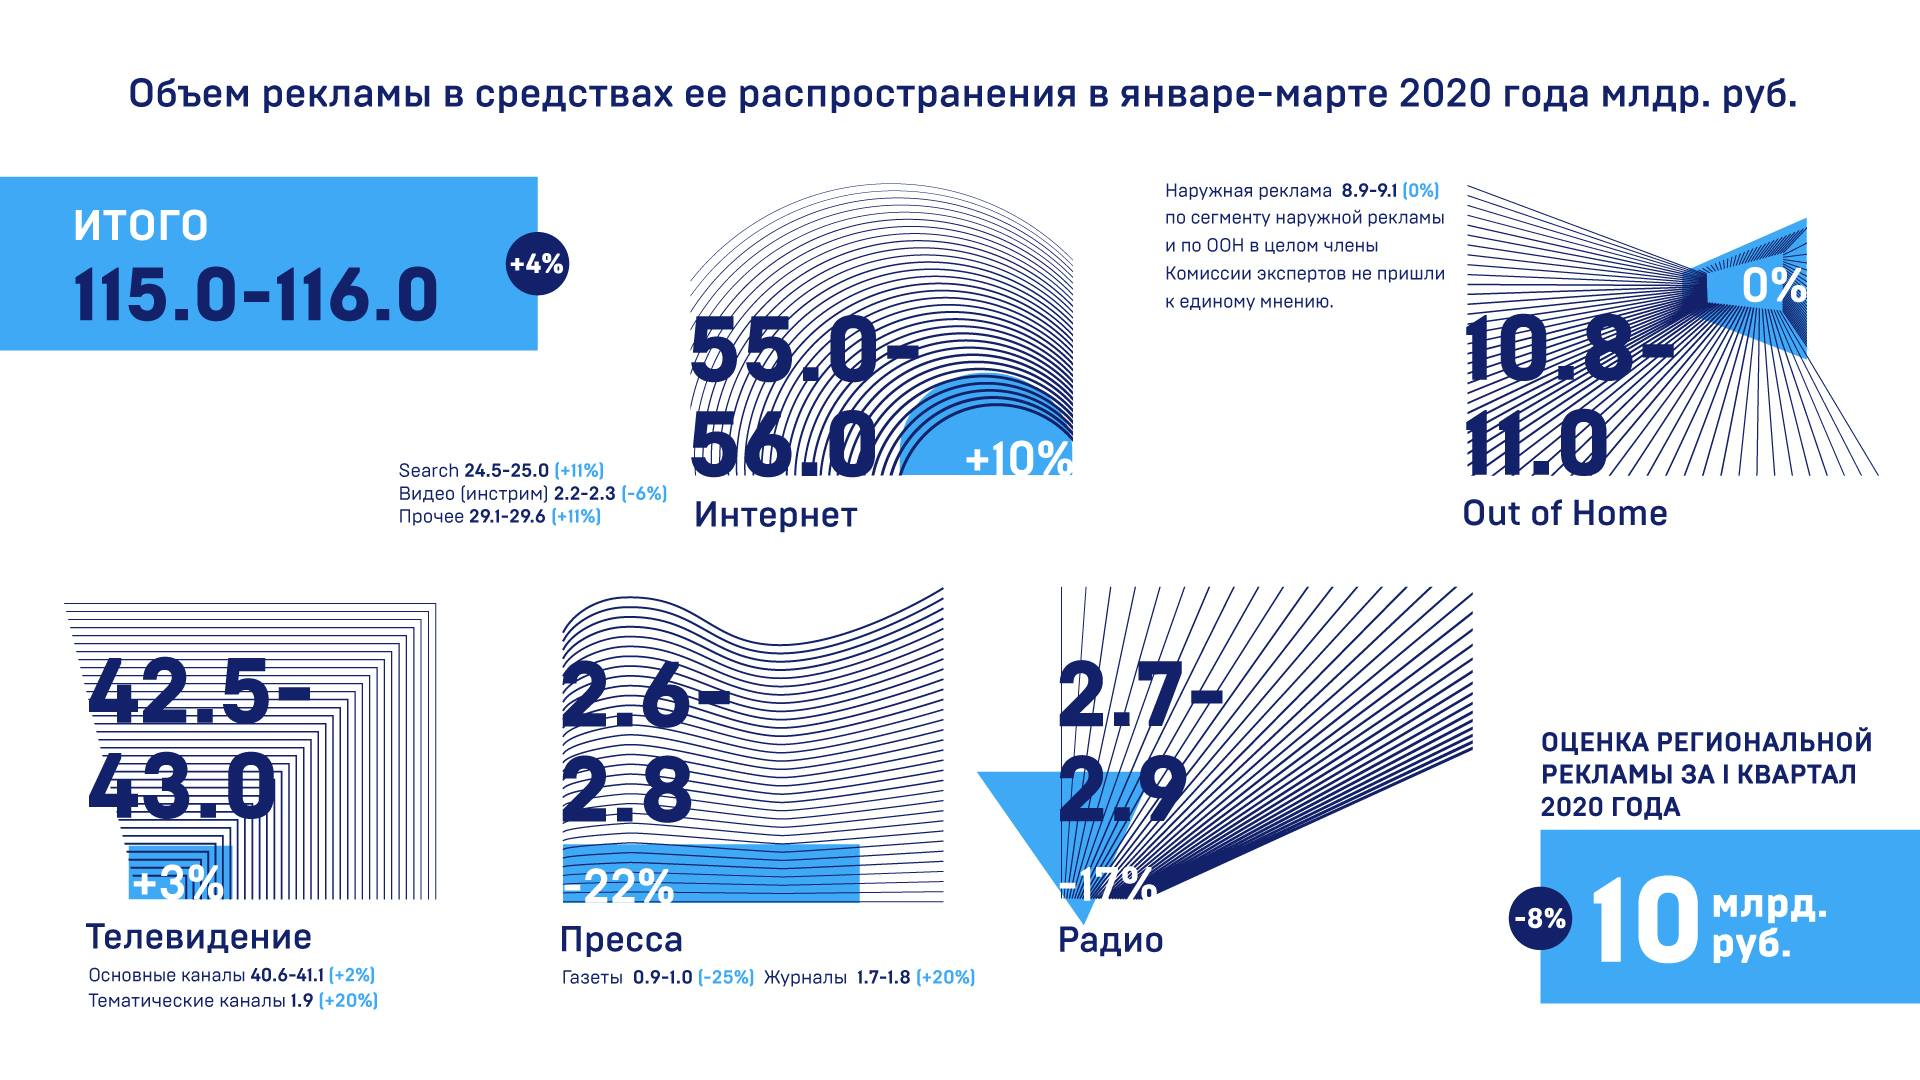 АКАР подвела итоги развития рекламного рынка России за I квартал 2020 года